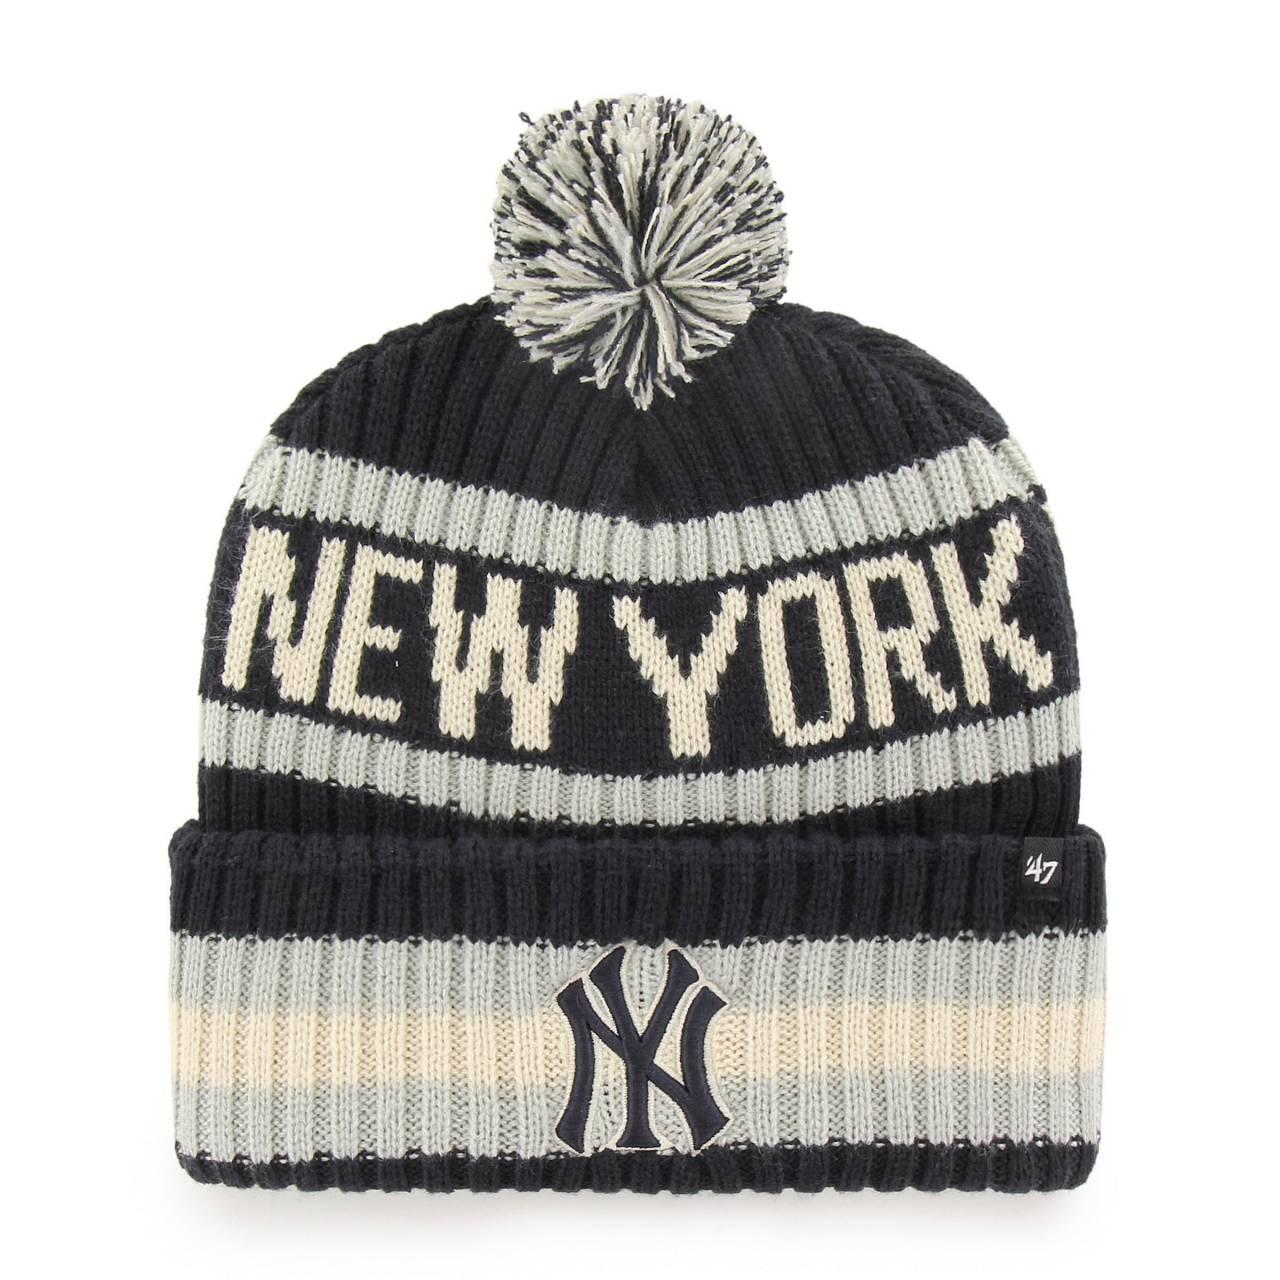 MLB NEW YORK YANKEES BERING ´47 CUFF KNIT NAVY/GREY